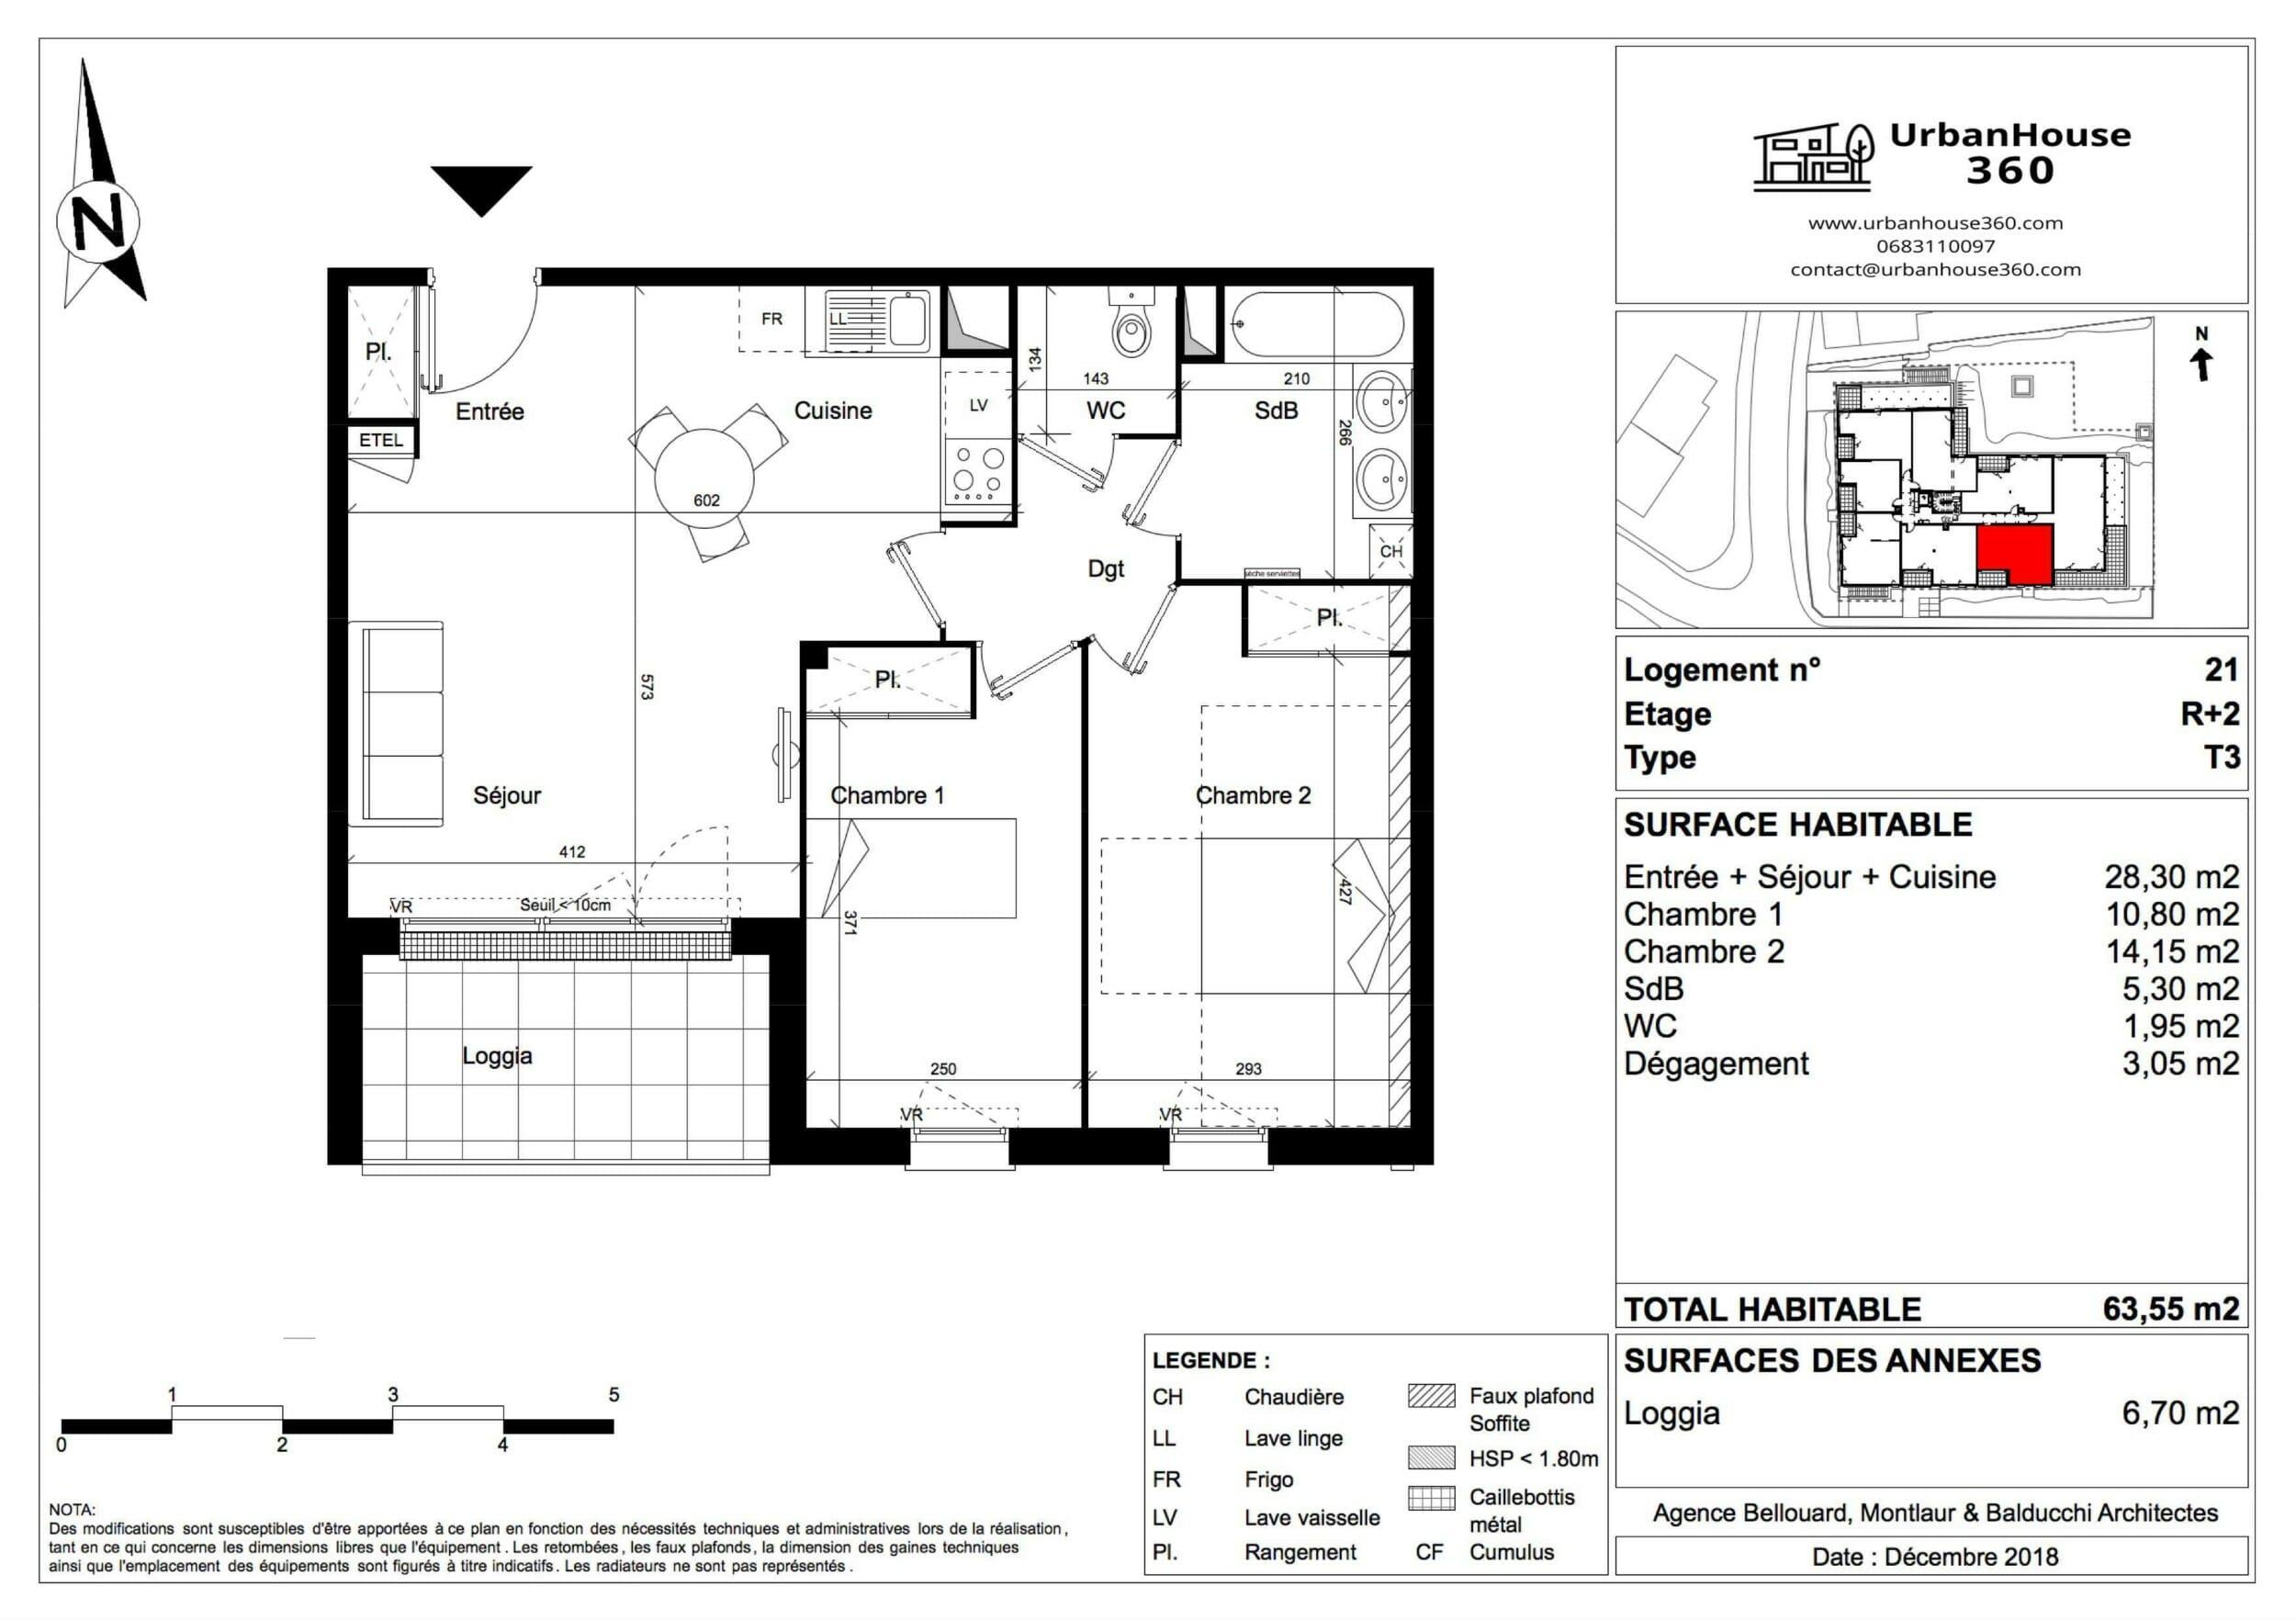 Urbanhouse360-Symphonie-Plan-T3-R+2-21